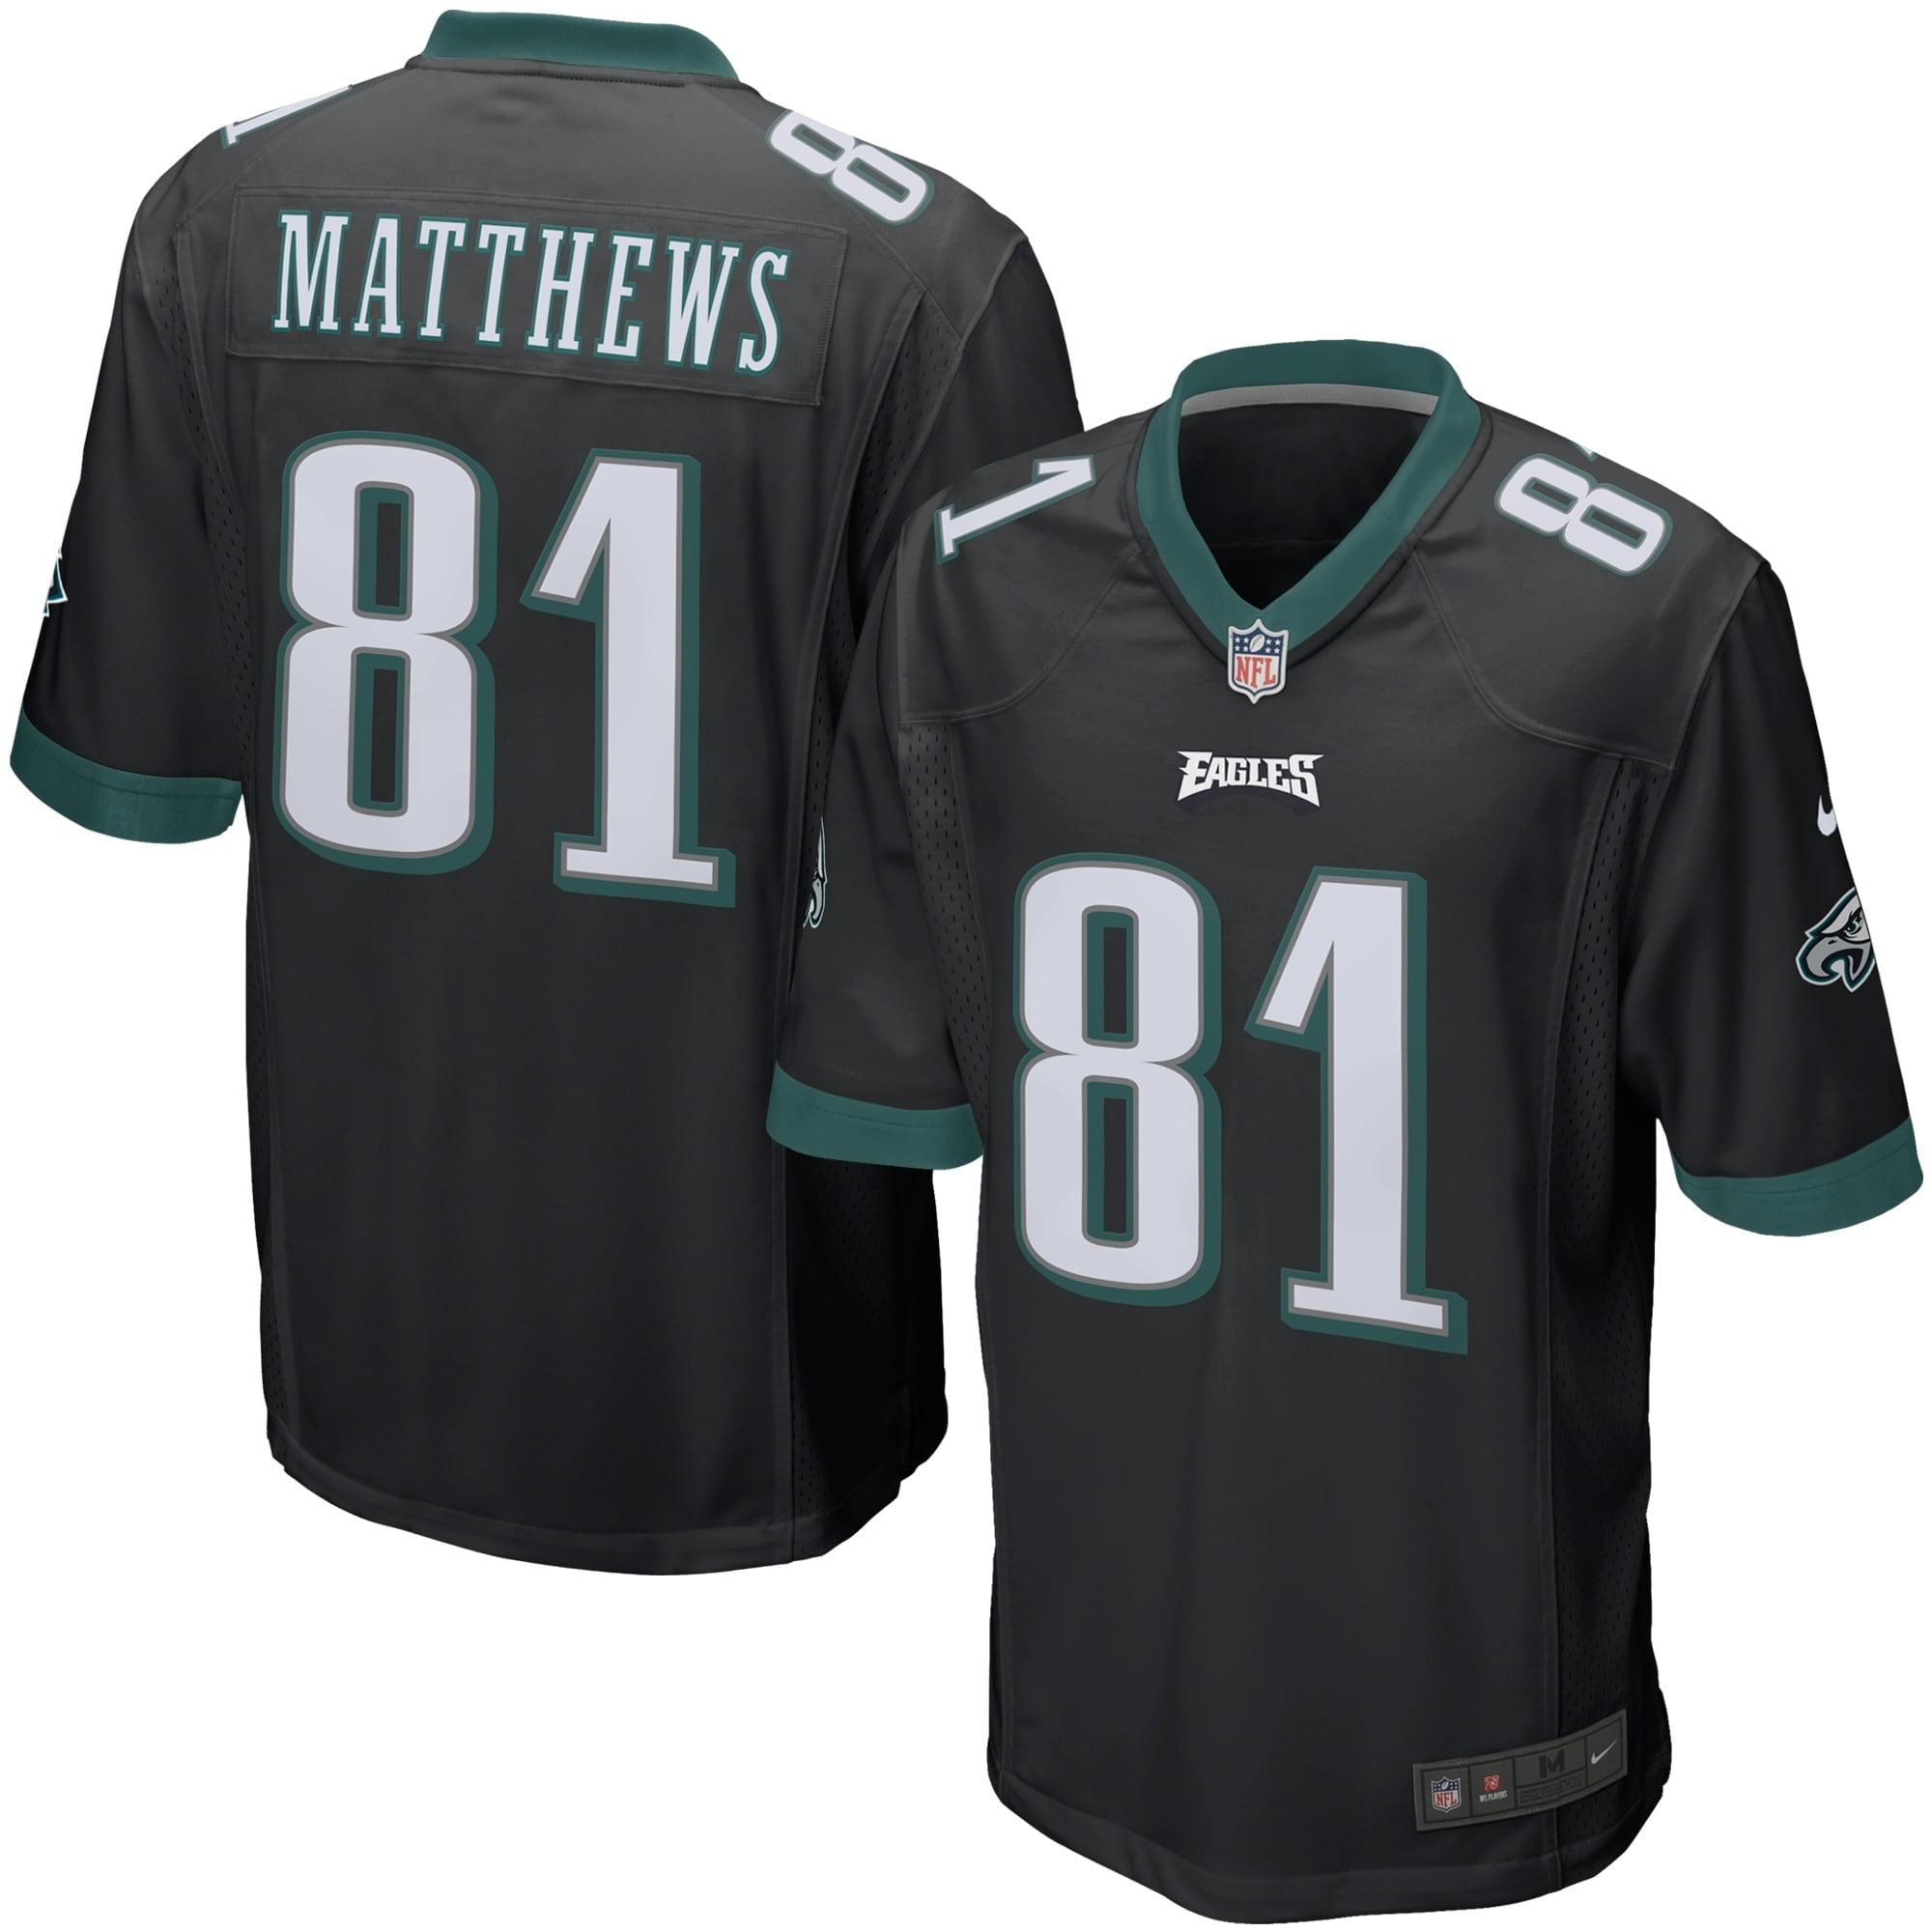 Jordan Matthews Philadelphia Eagles Nike Youth Alternate Game Jersey - Black - Walmart.com